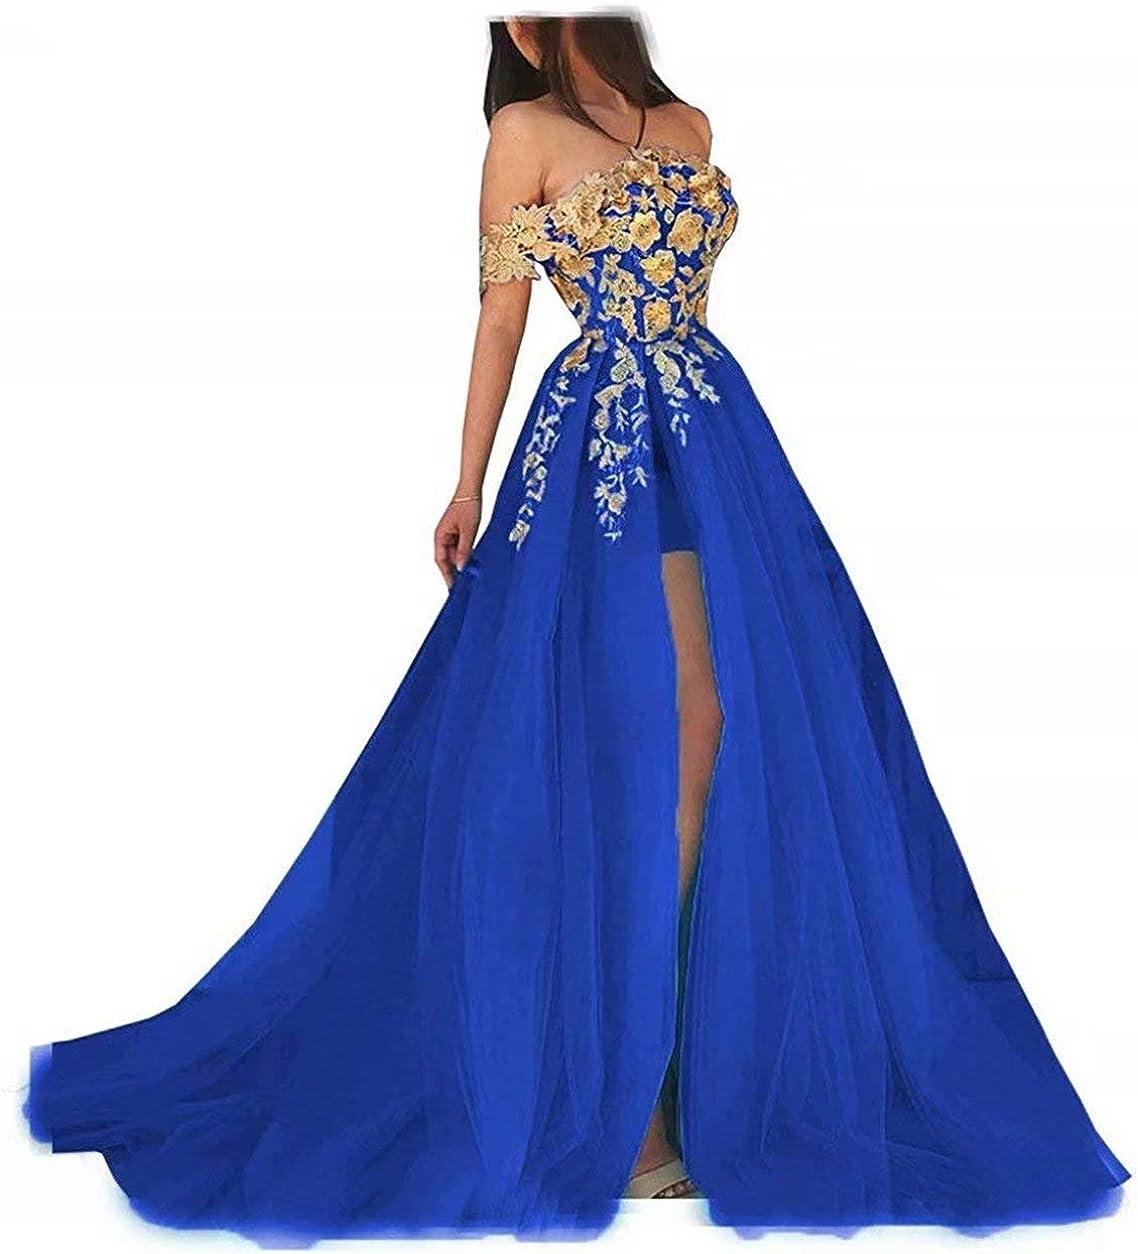 Women's Vintage Gold Applique Prom Party Dresses High Slit Off Shoulder Formal Quinceanera Gown Royal Blue